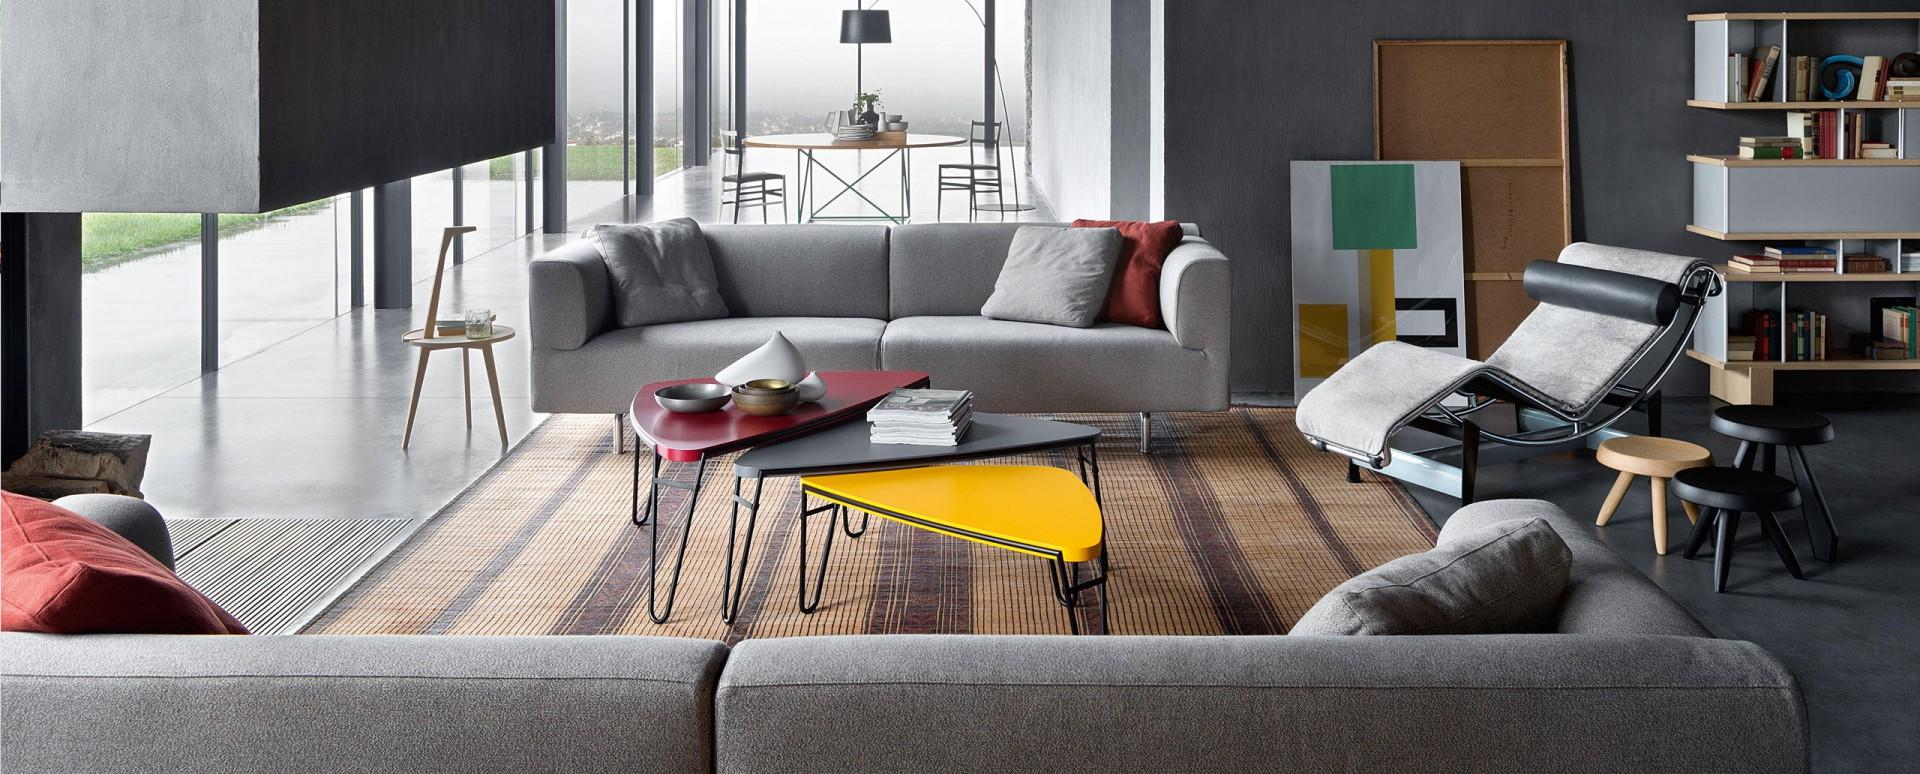 Sofa Met Divano firmy Cassina. Projekt: Piero Lissoni. Fot. Cassina